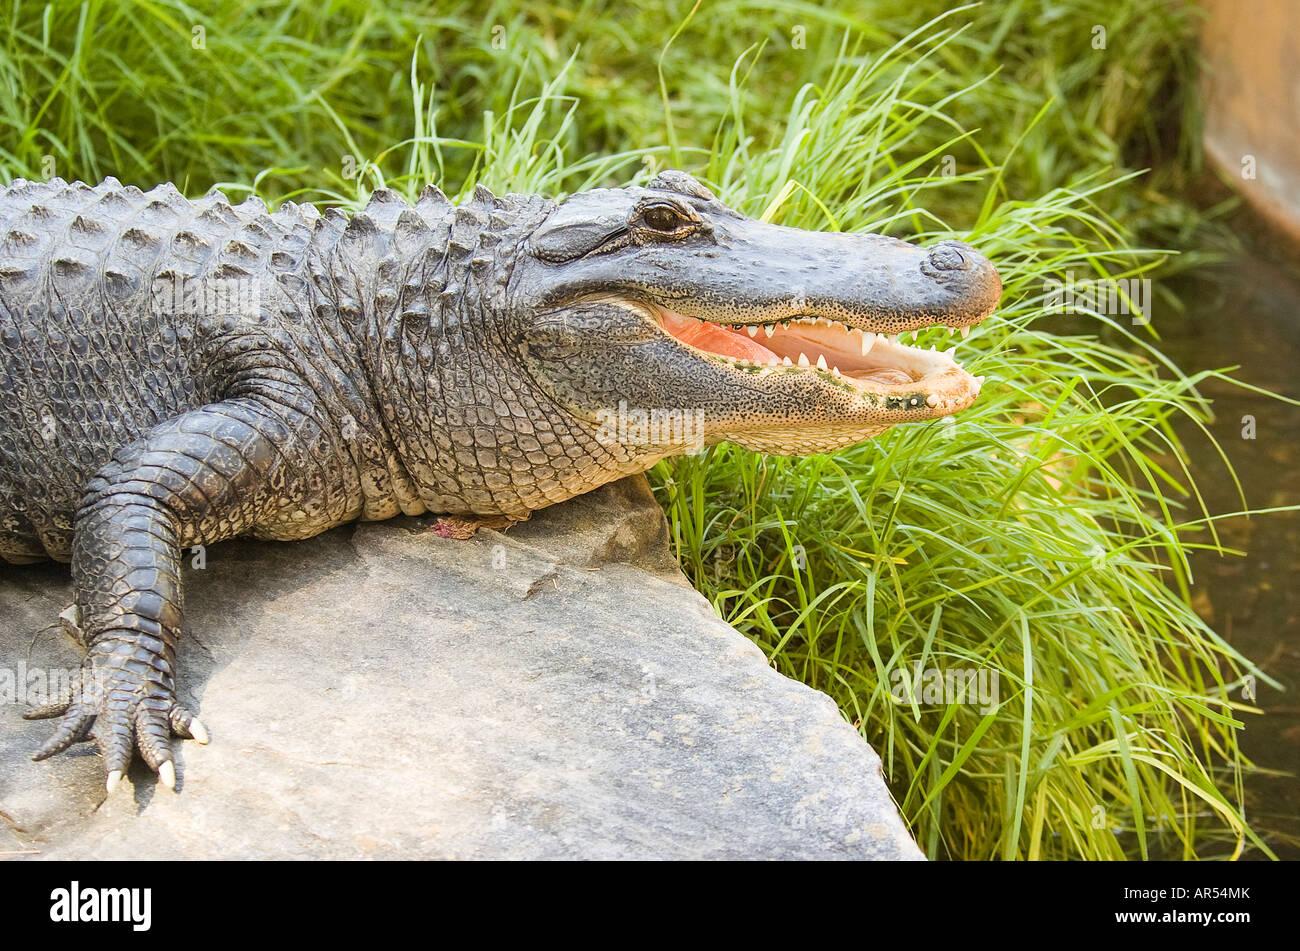 American Alligator Alligator mississippiensis - Stock Image